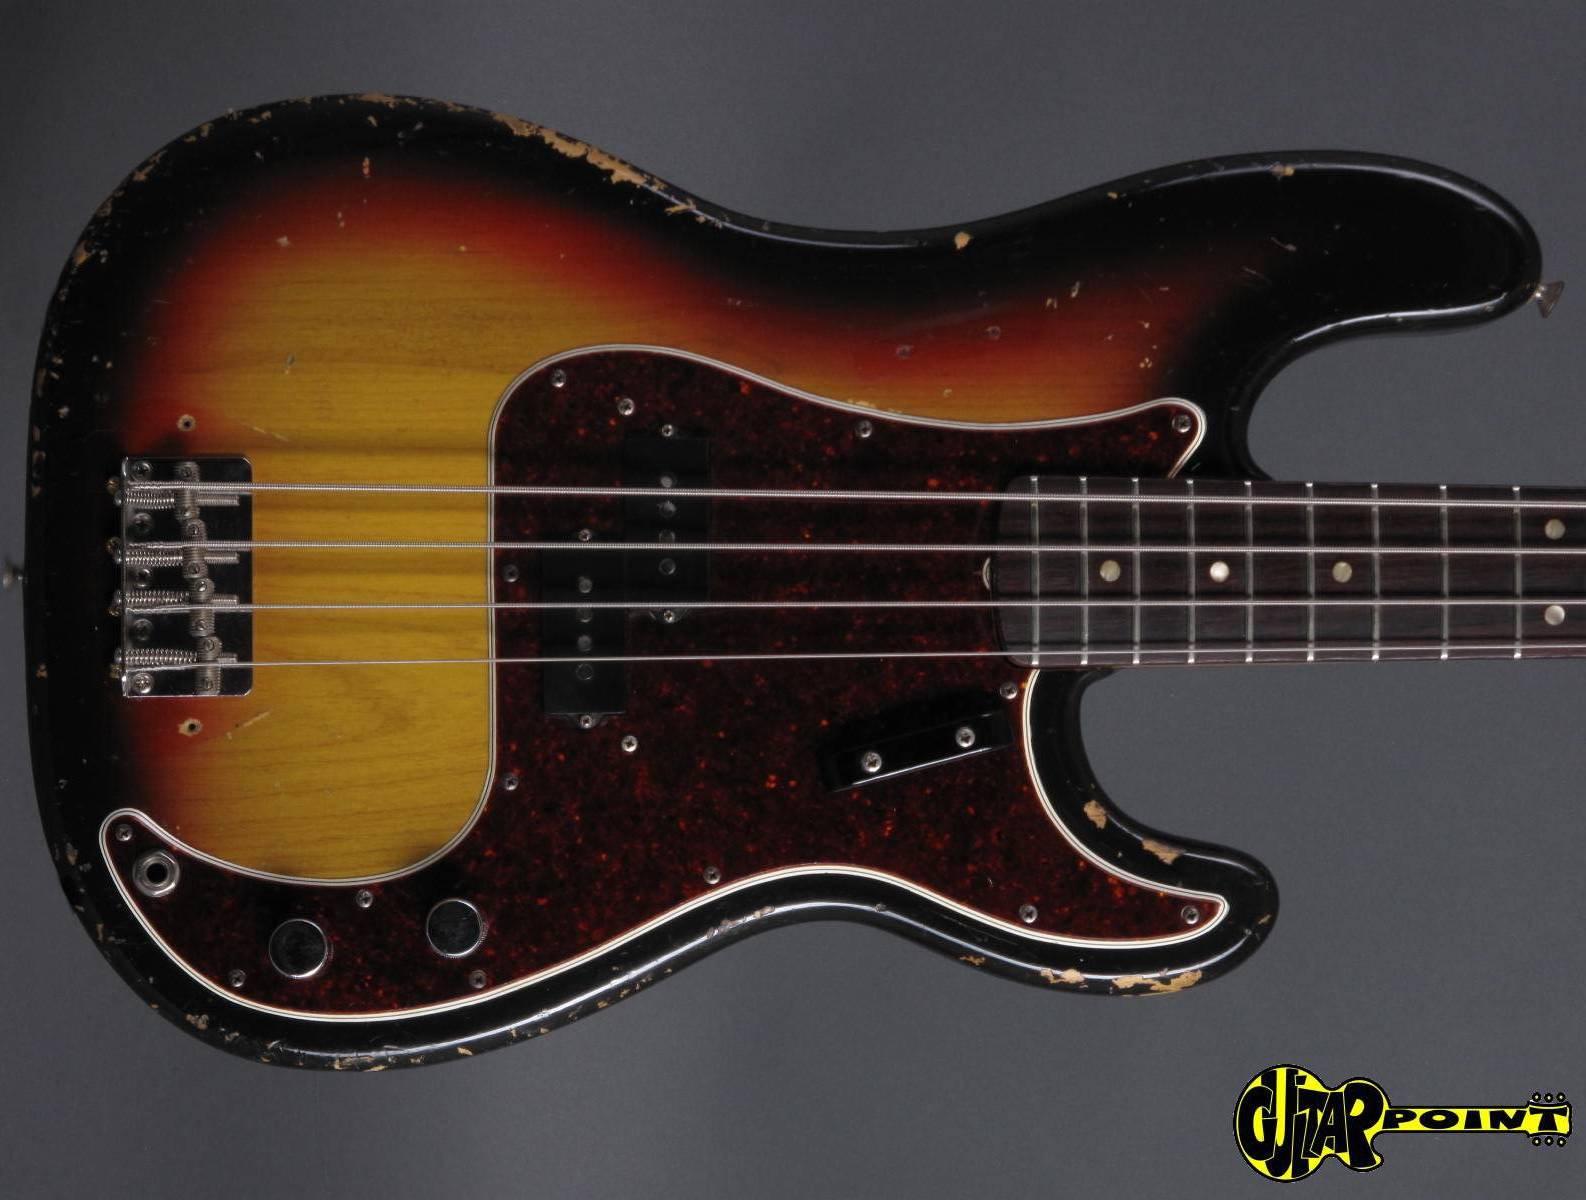 fender precision p bass 1966 3 tone sunburst bass for sale guitarpoint. Black Bedroom Furniture Sets. Home Design Ideas